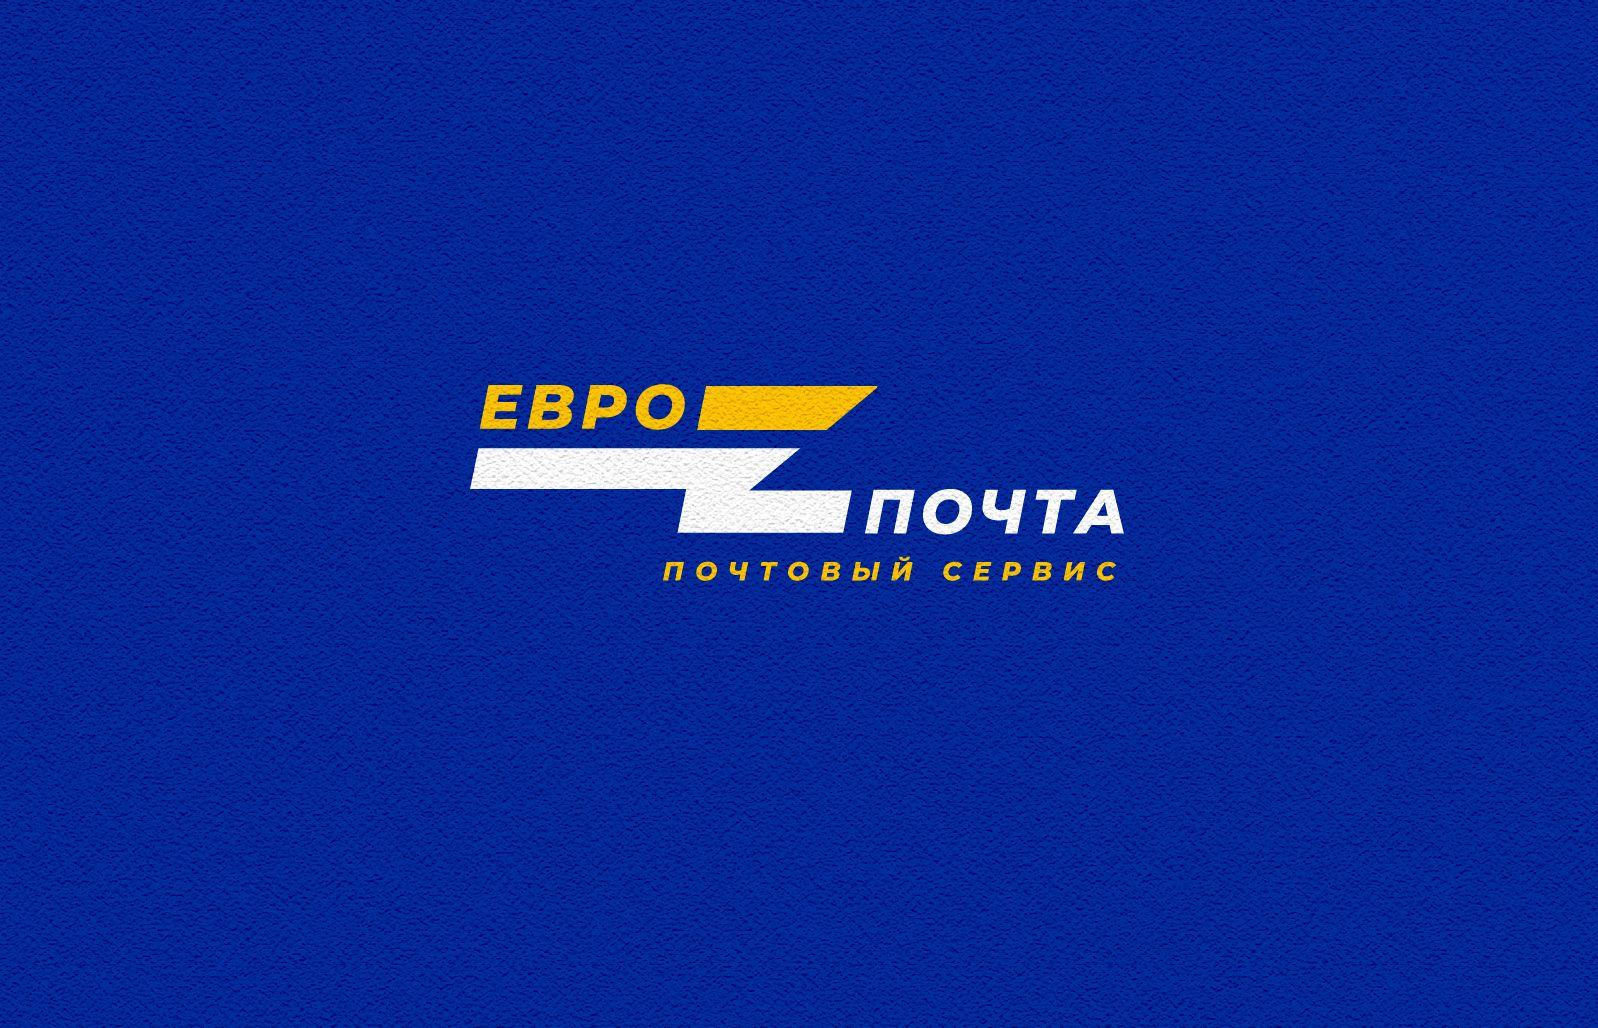 Логотип для ЕвроПочта - дизайнер andblin61